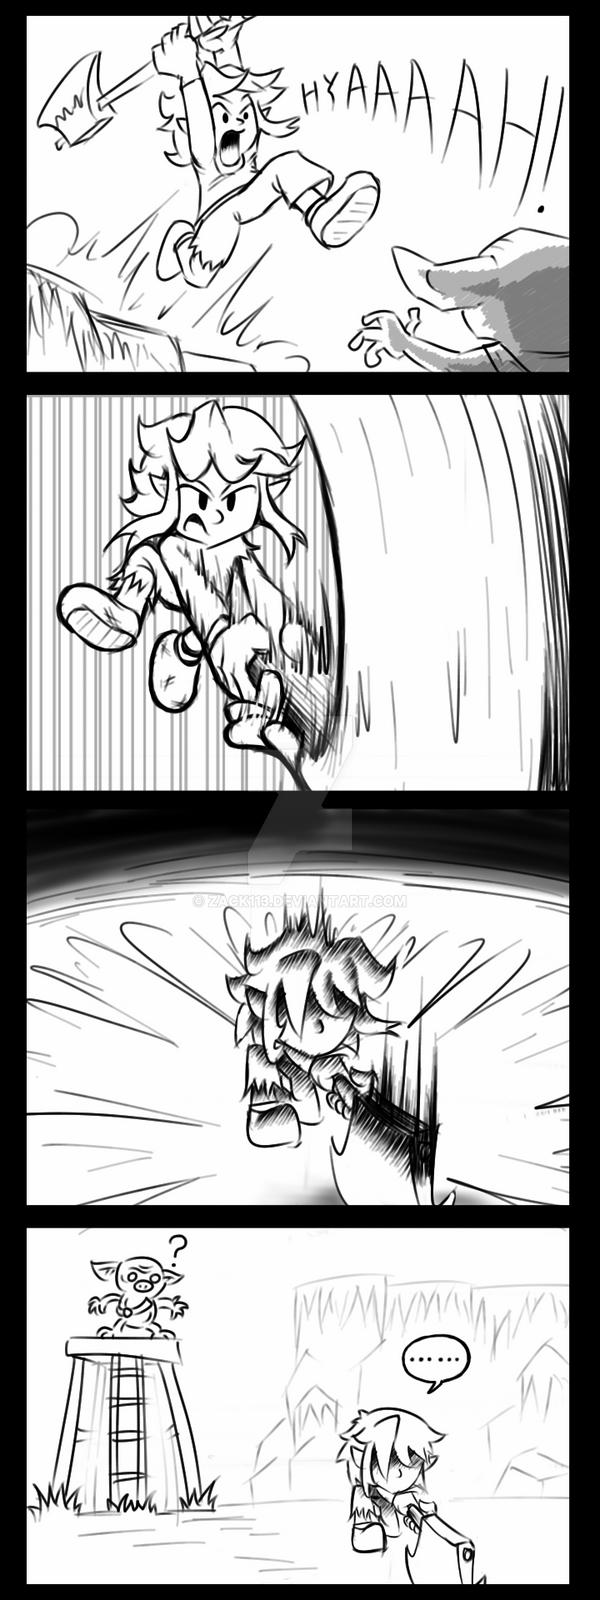 BotO 04 - Jump Slash by Zack113